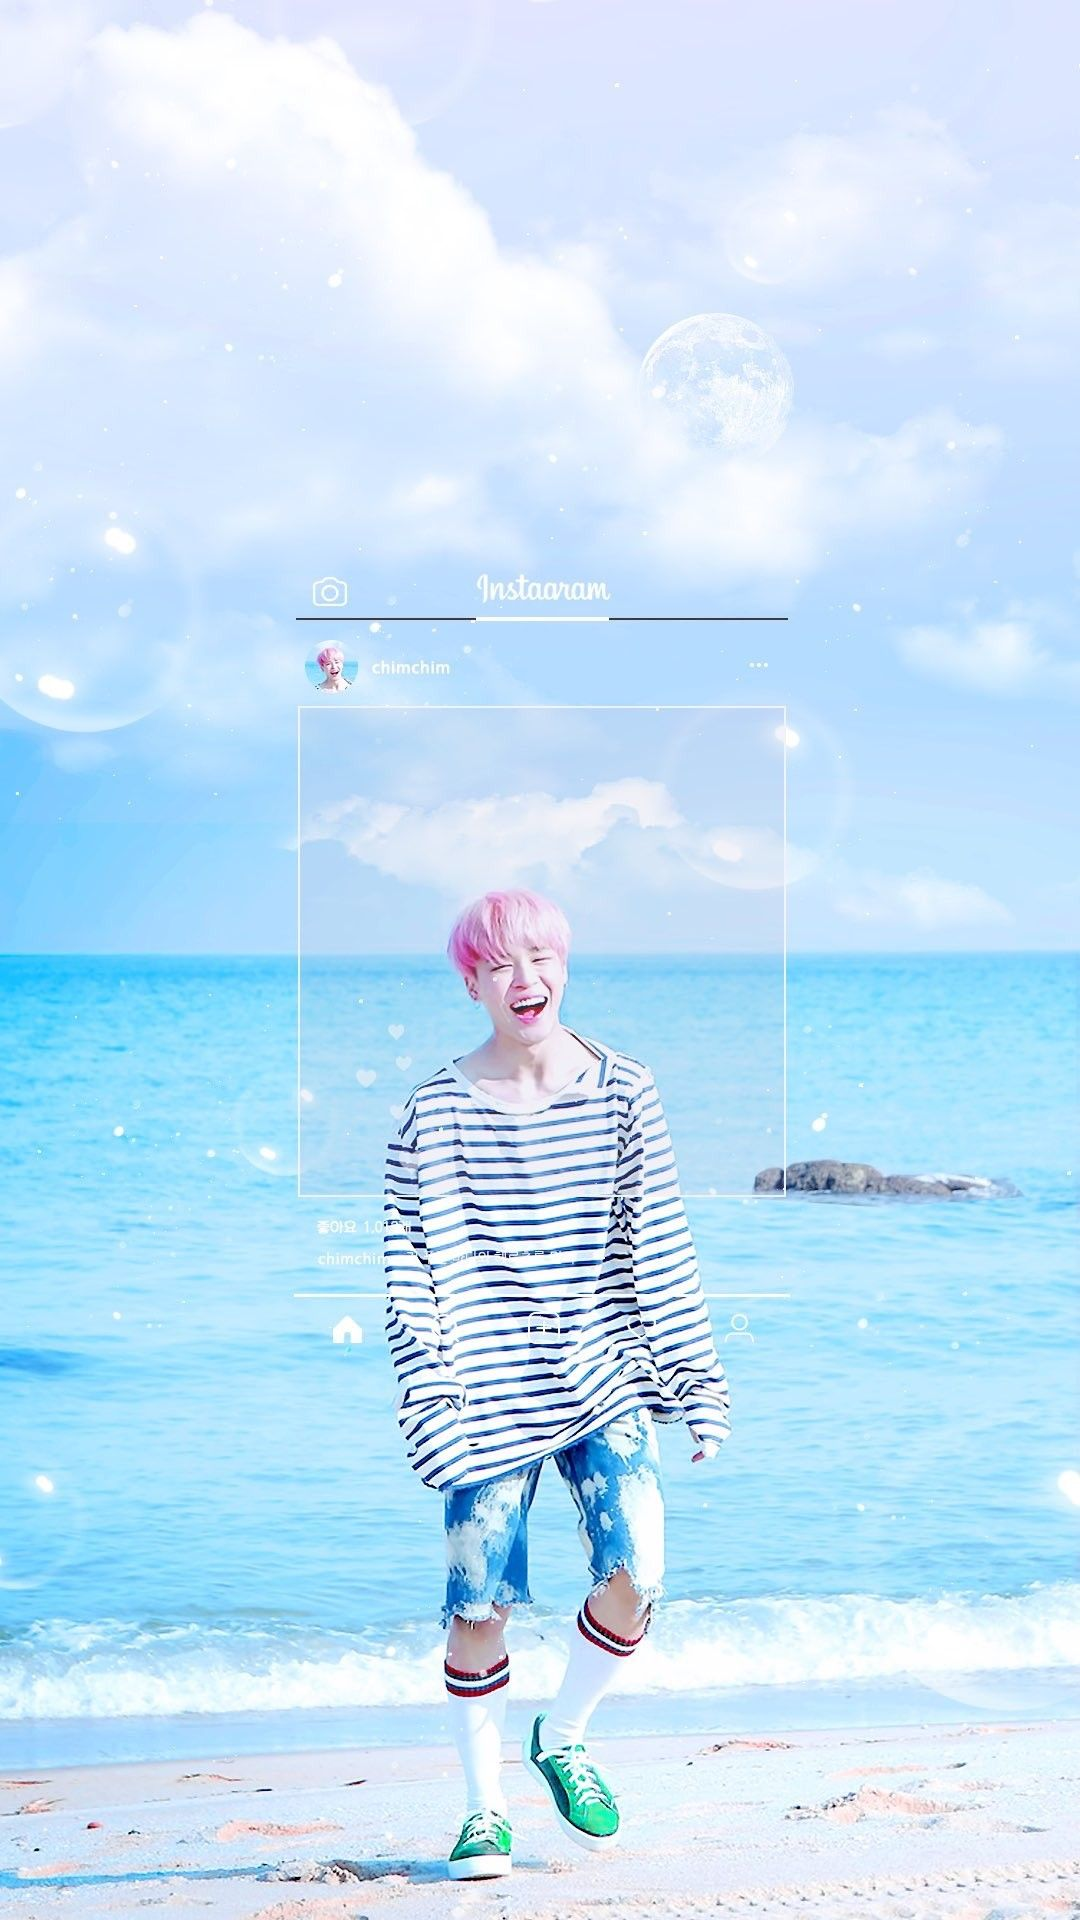 Iphone Aesthetic Lockscreen Bts Wallpaper Hd Art Wallpaper Bts Wallpaper Bts Jimin Bts Pictures Cute bts wallpaper gif